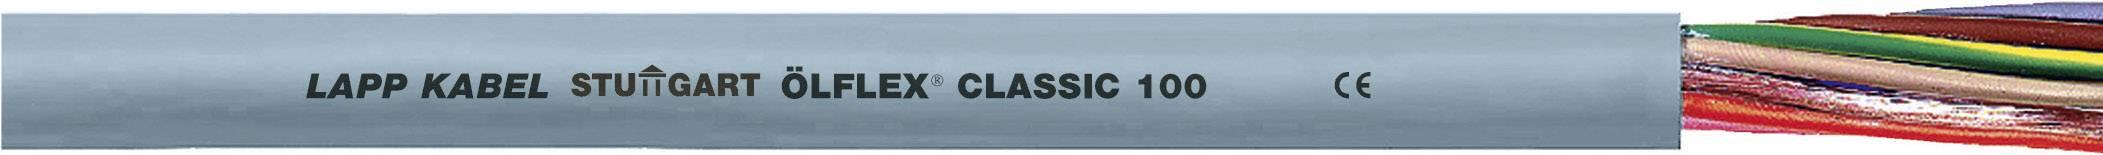 Kabel LappKabel Ölflex CLASSIC 100 4G6 (00101063), PVC, 13,8 mm, 750 V, šedá, 1000 m